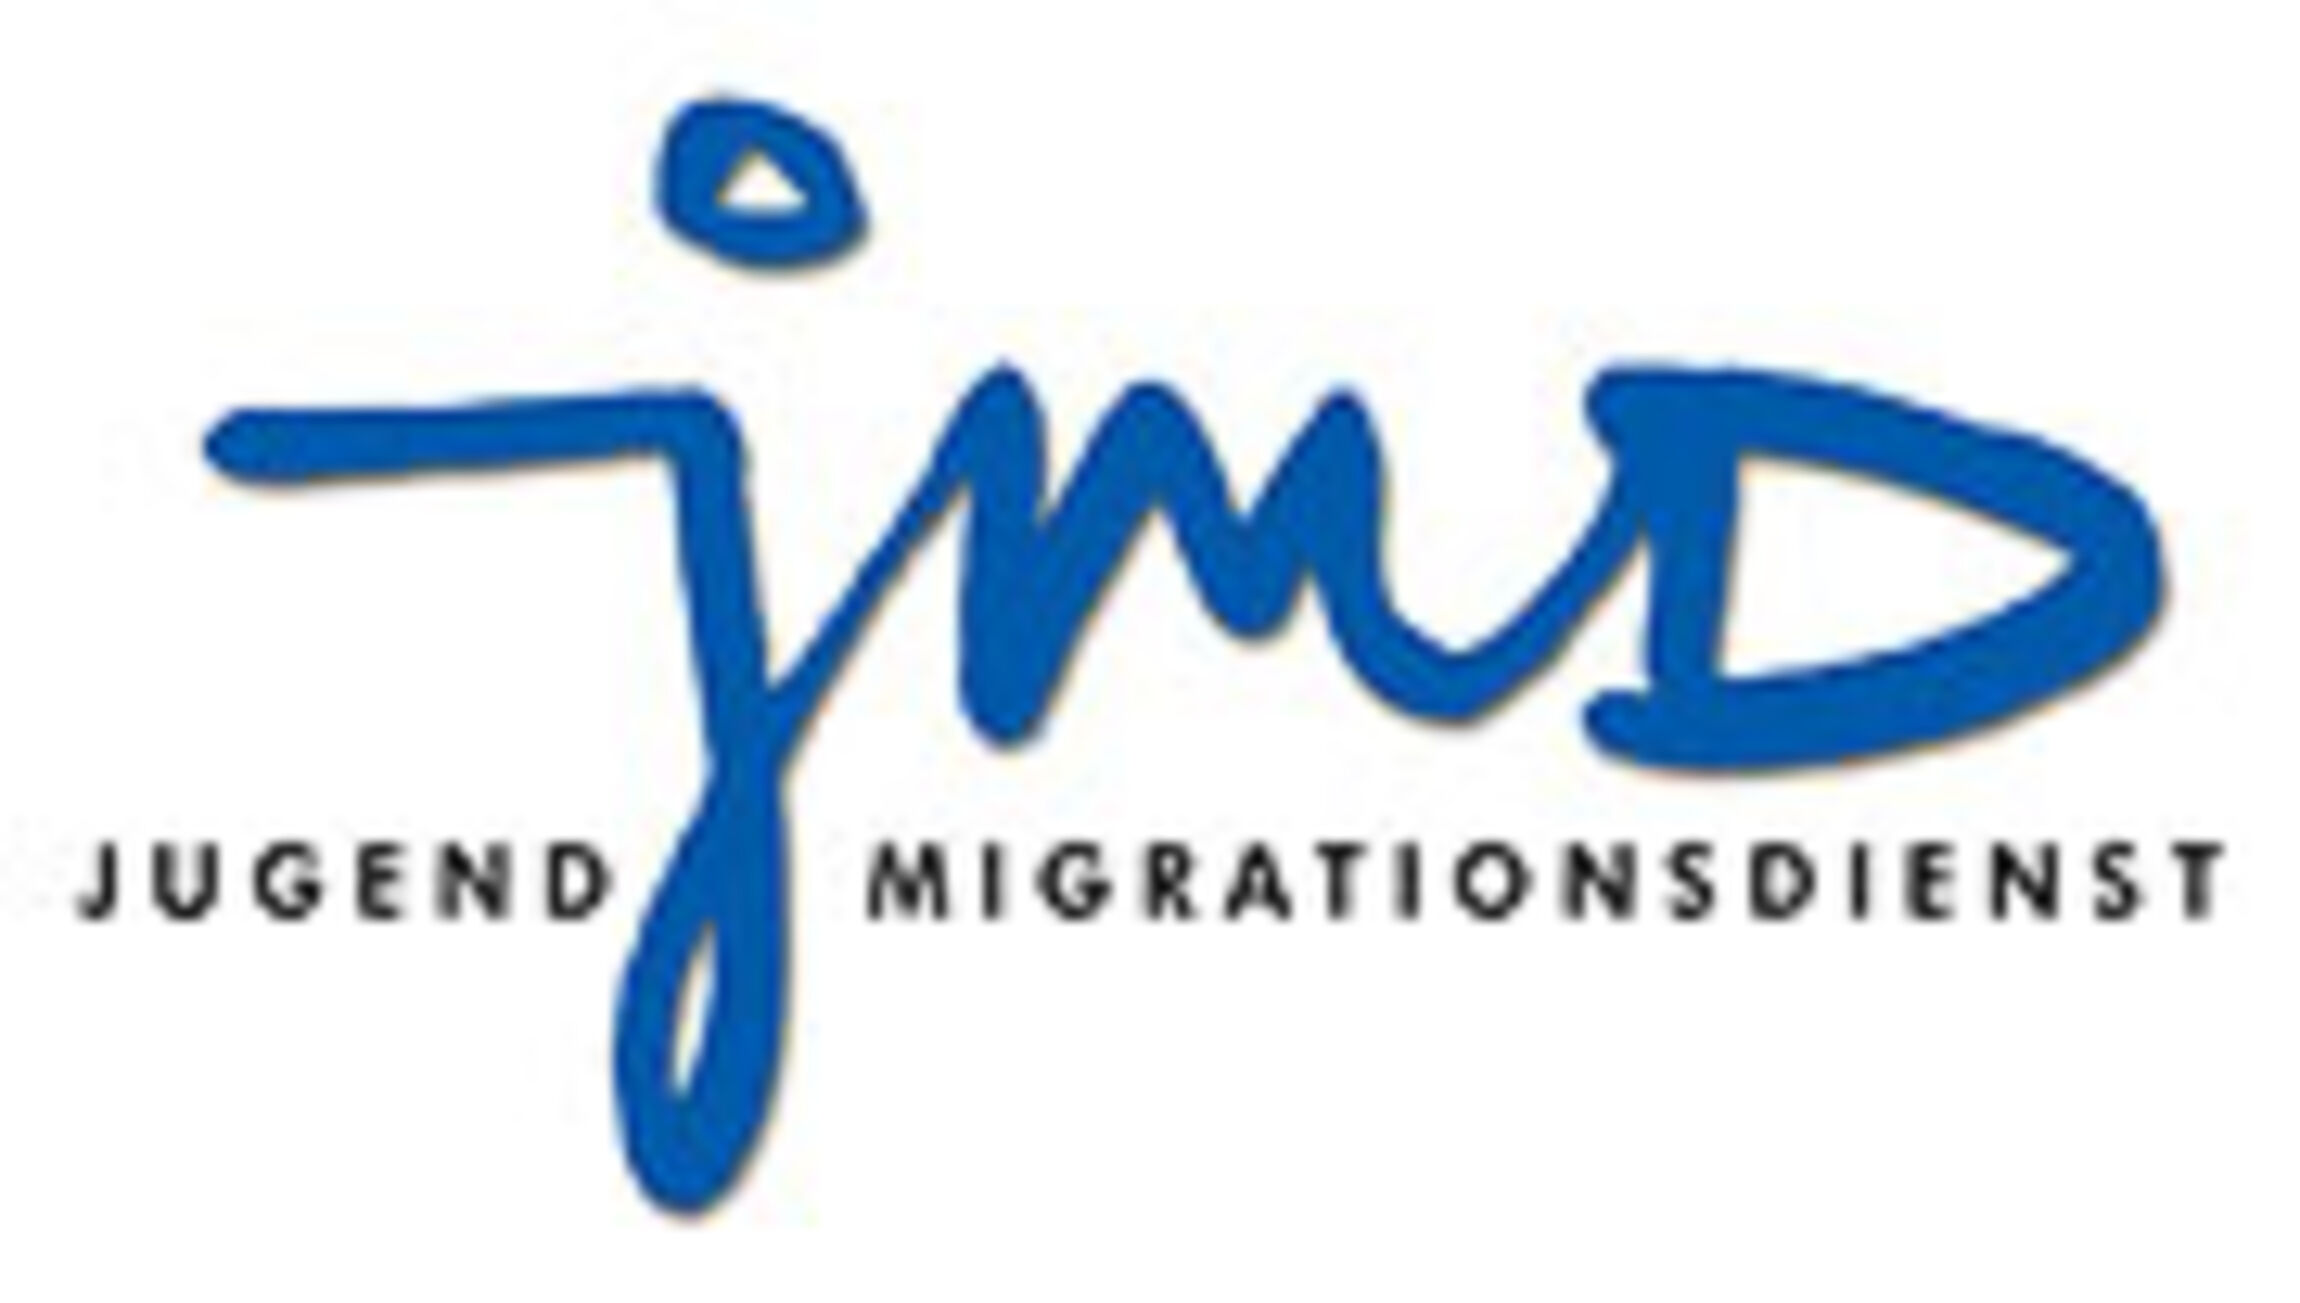 Jmd-signet